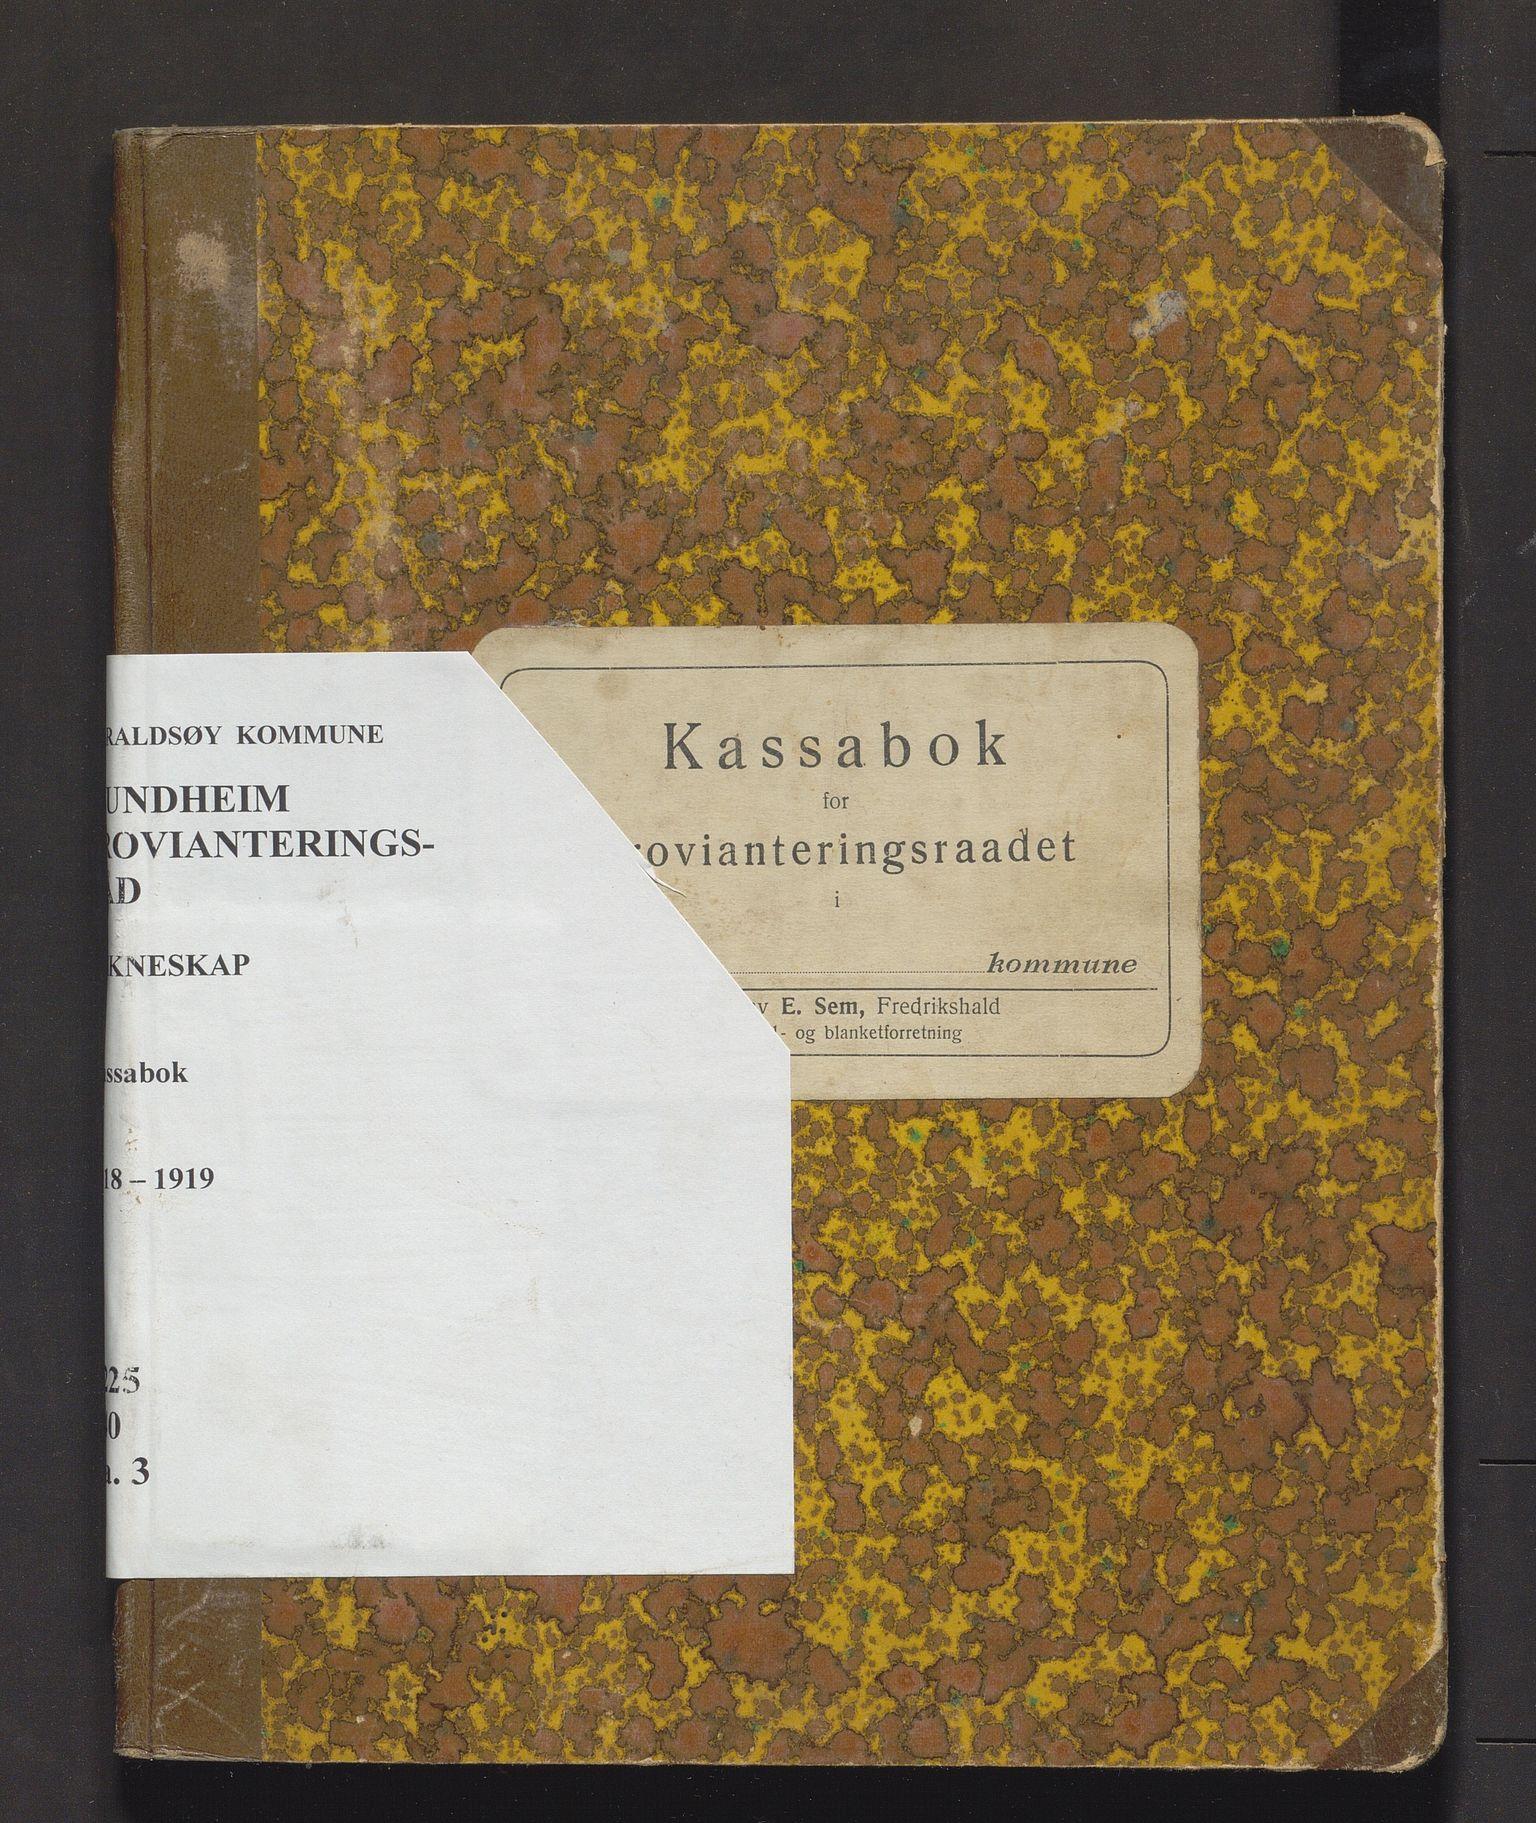 IKAH, Varaldsøy kommune. Mundheim provianteringsråd, R/Ra/L0003: Kontobok  for Mundheim provianteringsråd, 1918-1919